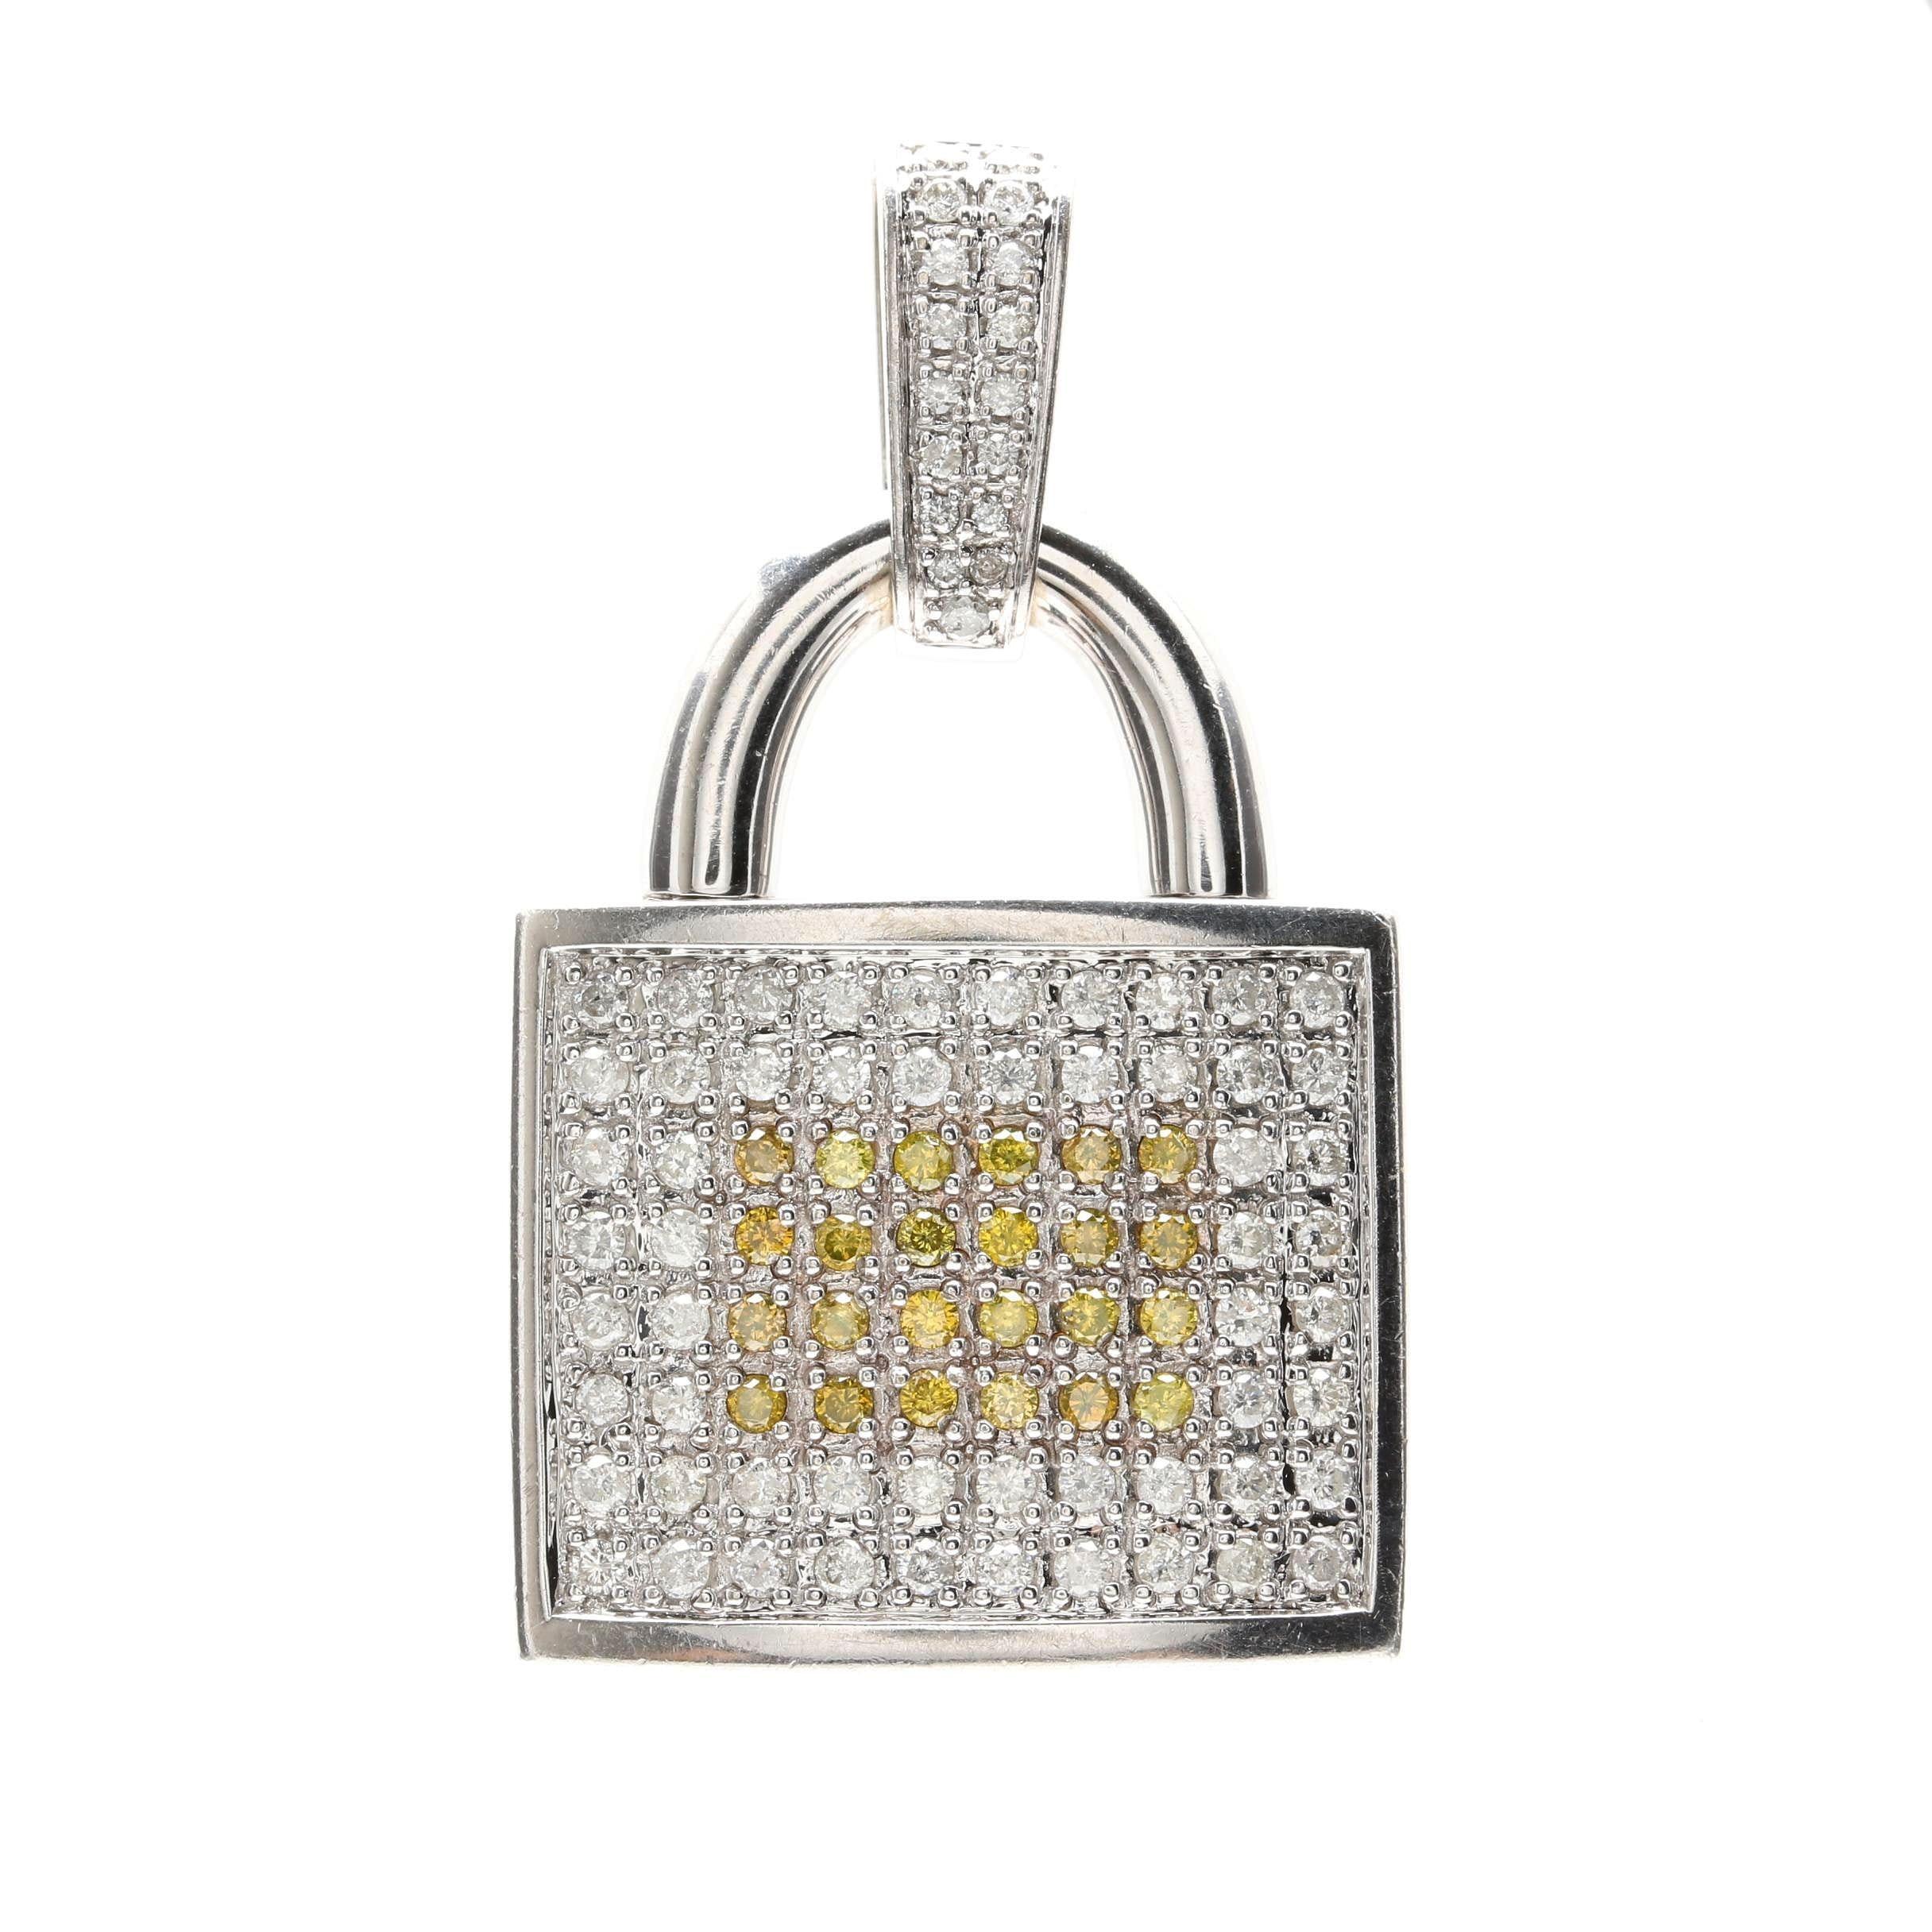 14K White Gold 1.56 CTW Diamond Lock Pendant